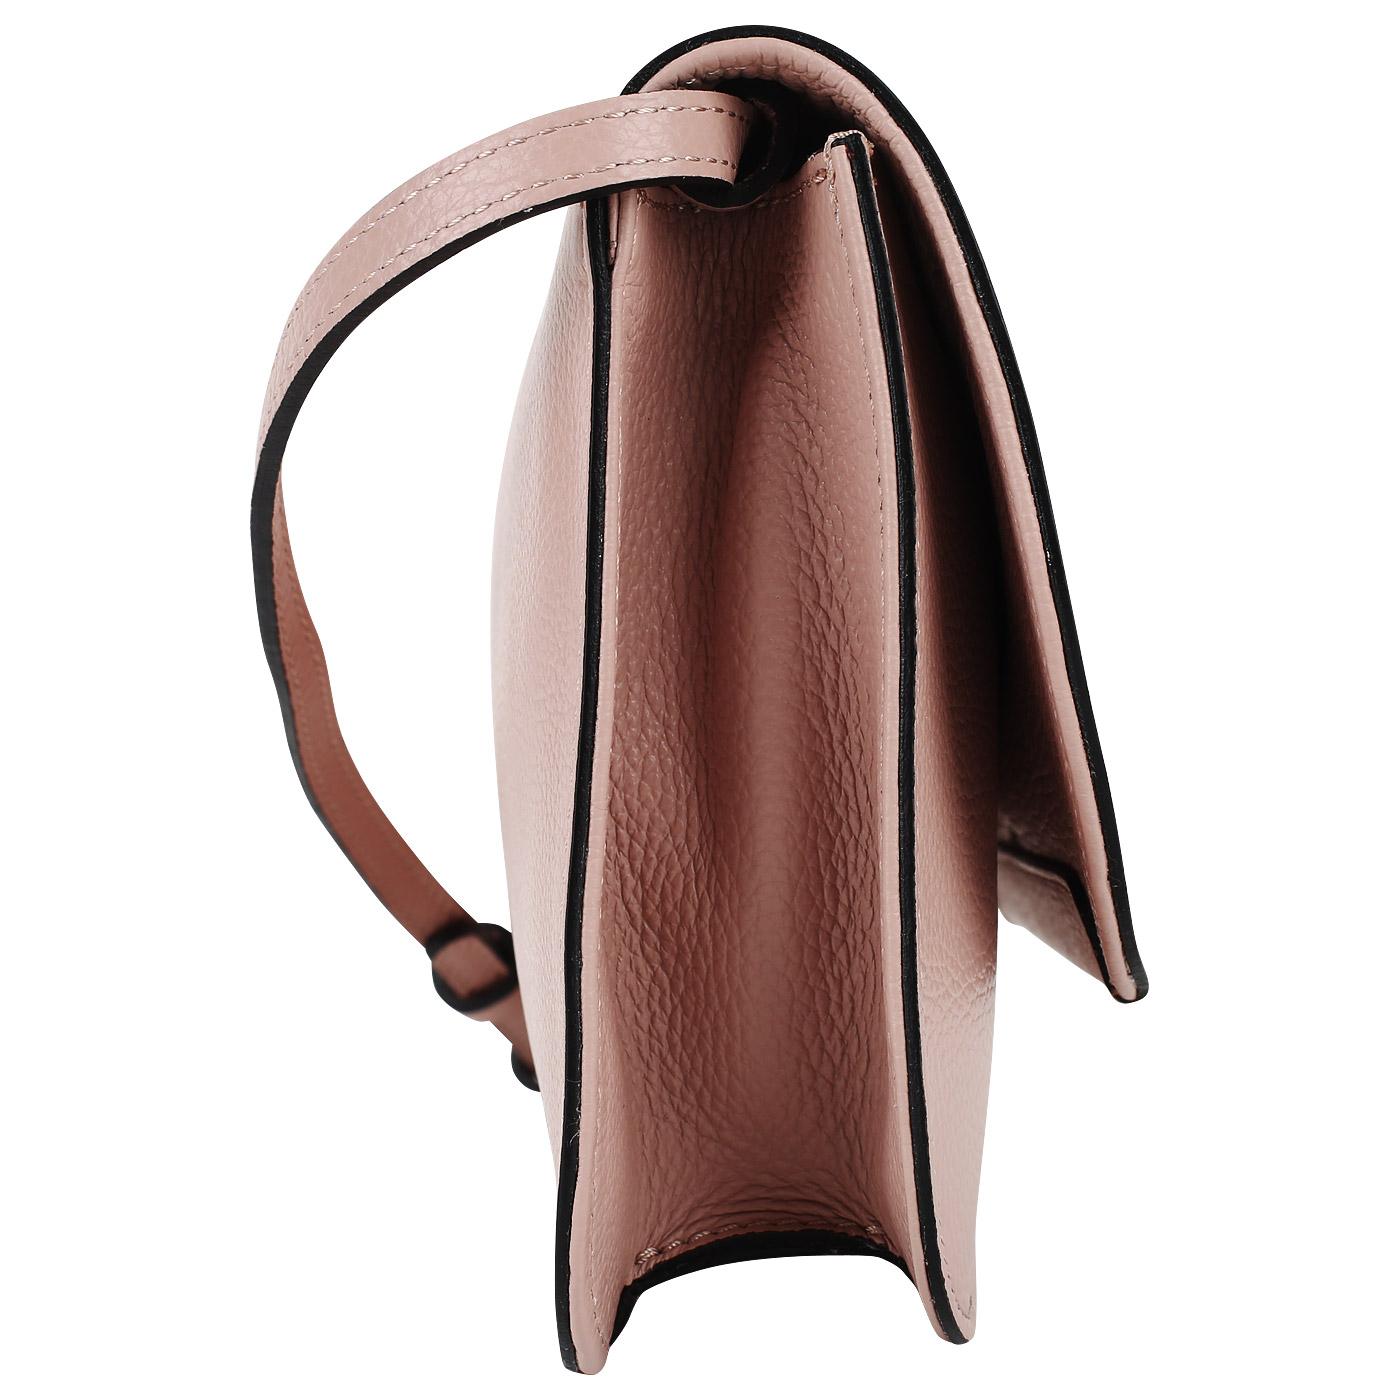 218296a3f771 Женский кожаный клатч с ремешком Coccinelle Melanie BQ0 19 01 ...